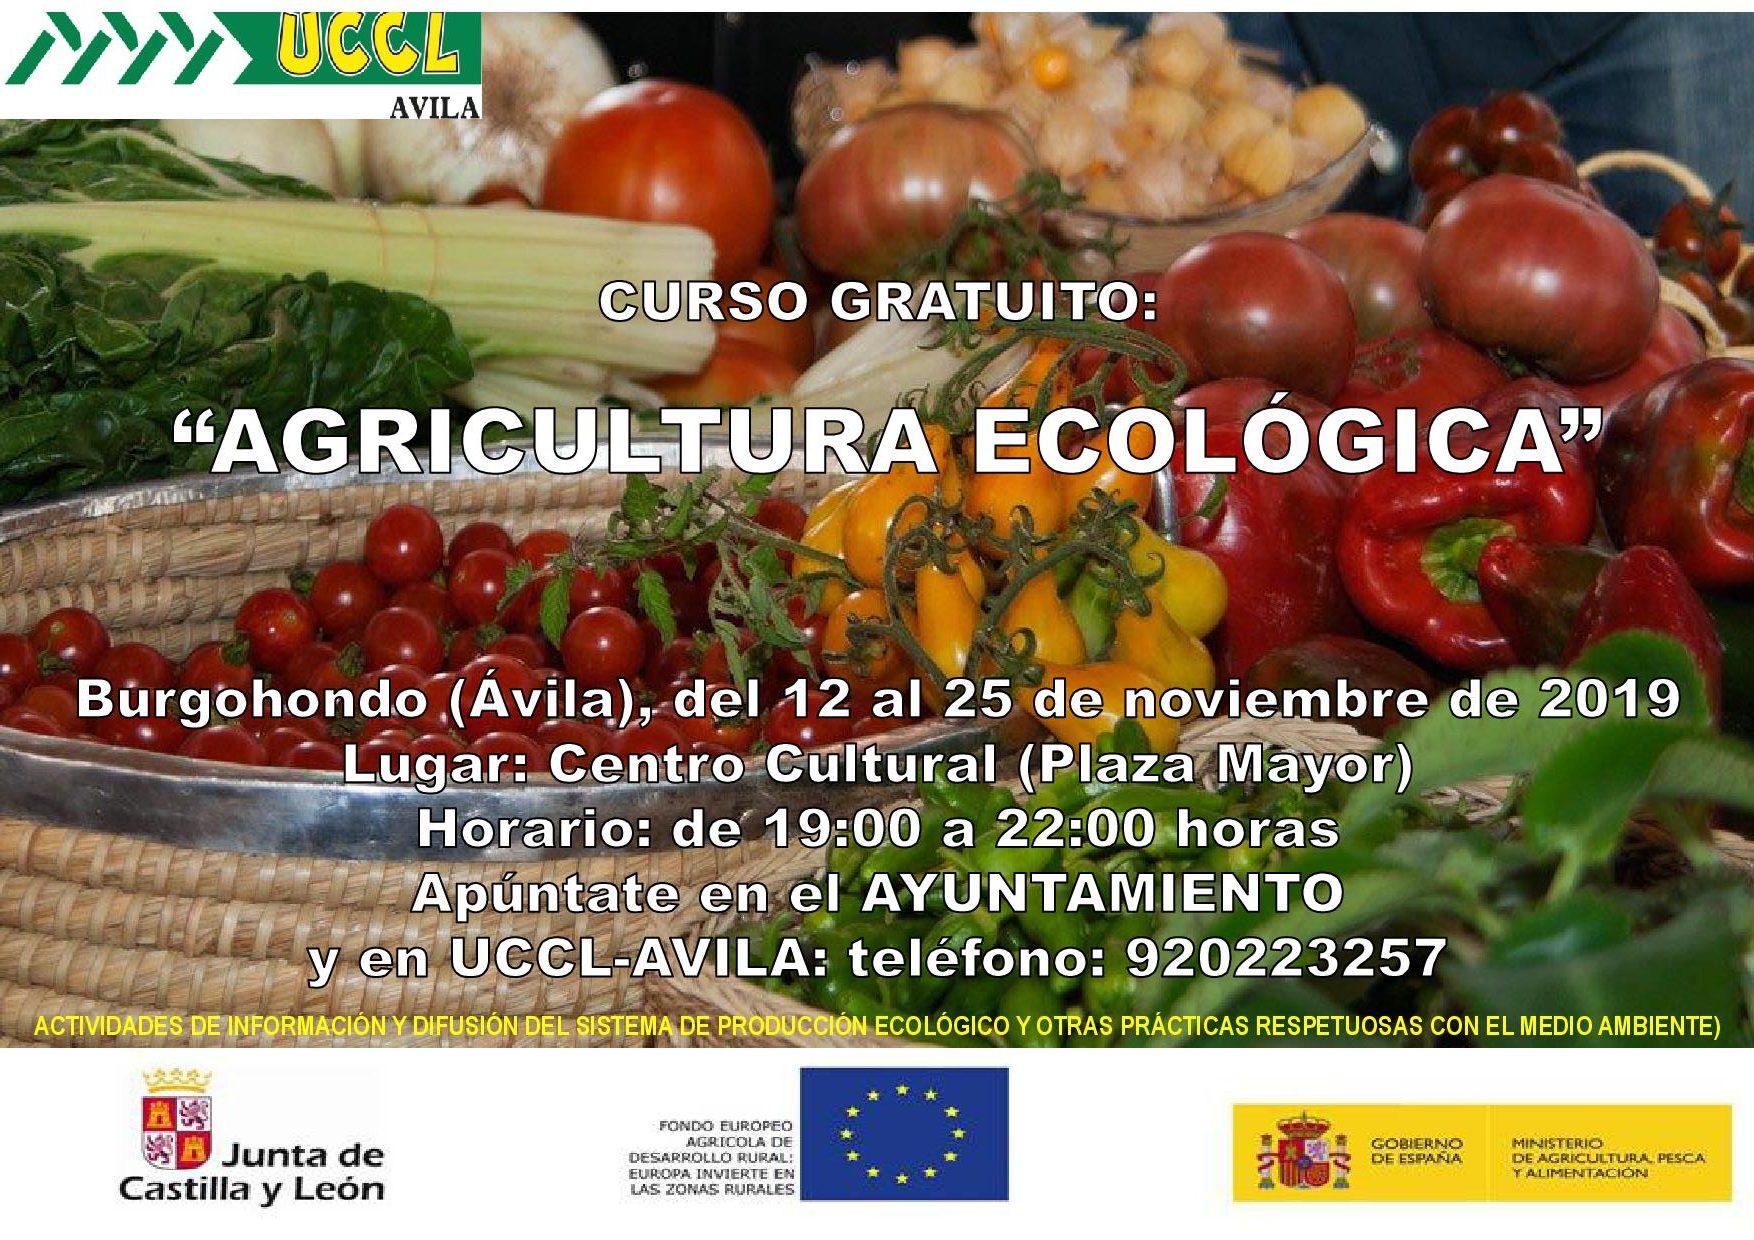 CURSO GRATUITO DE AGRICULTURA ECOLÓGICA